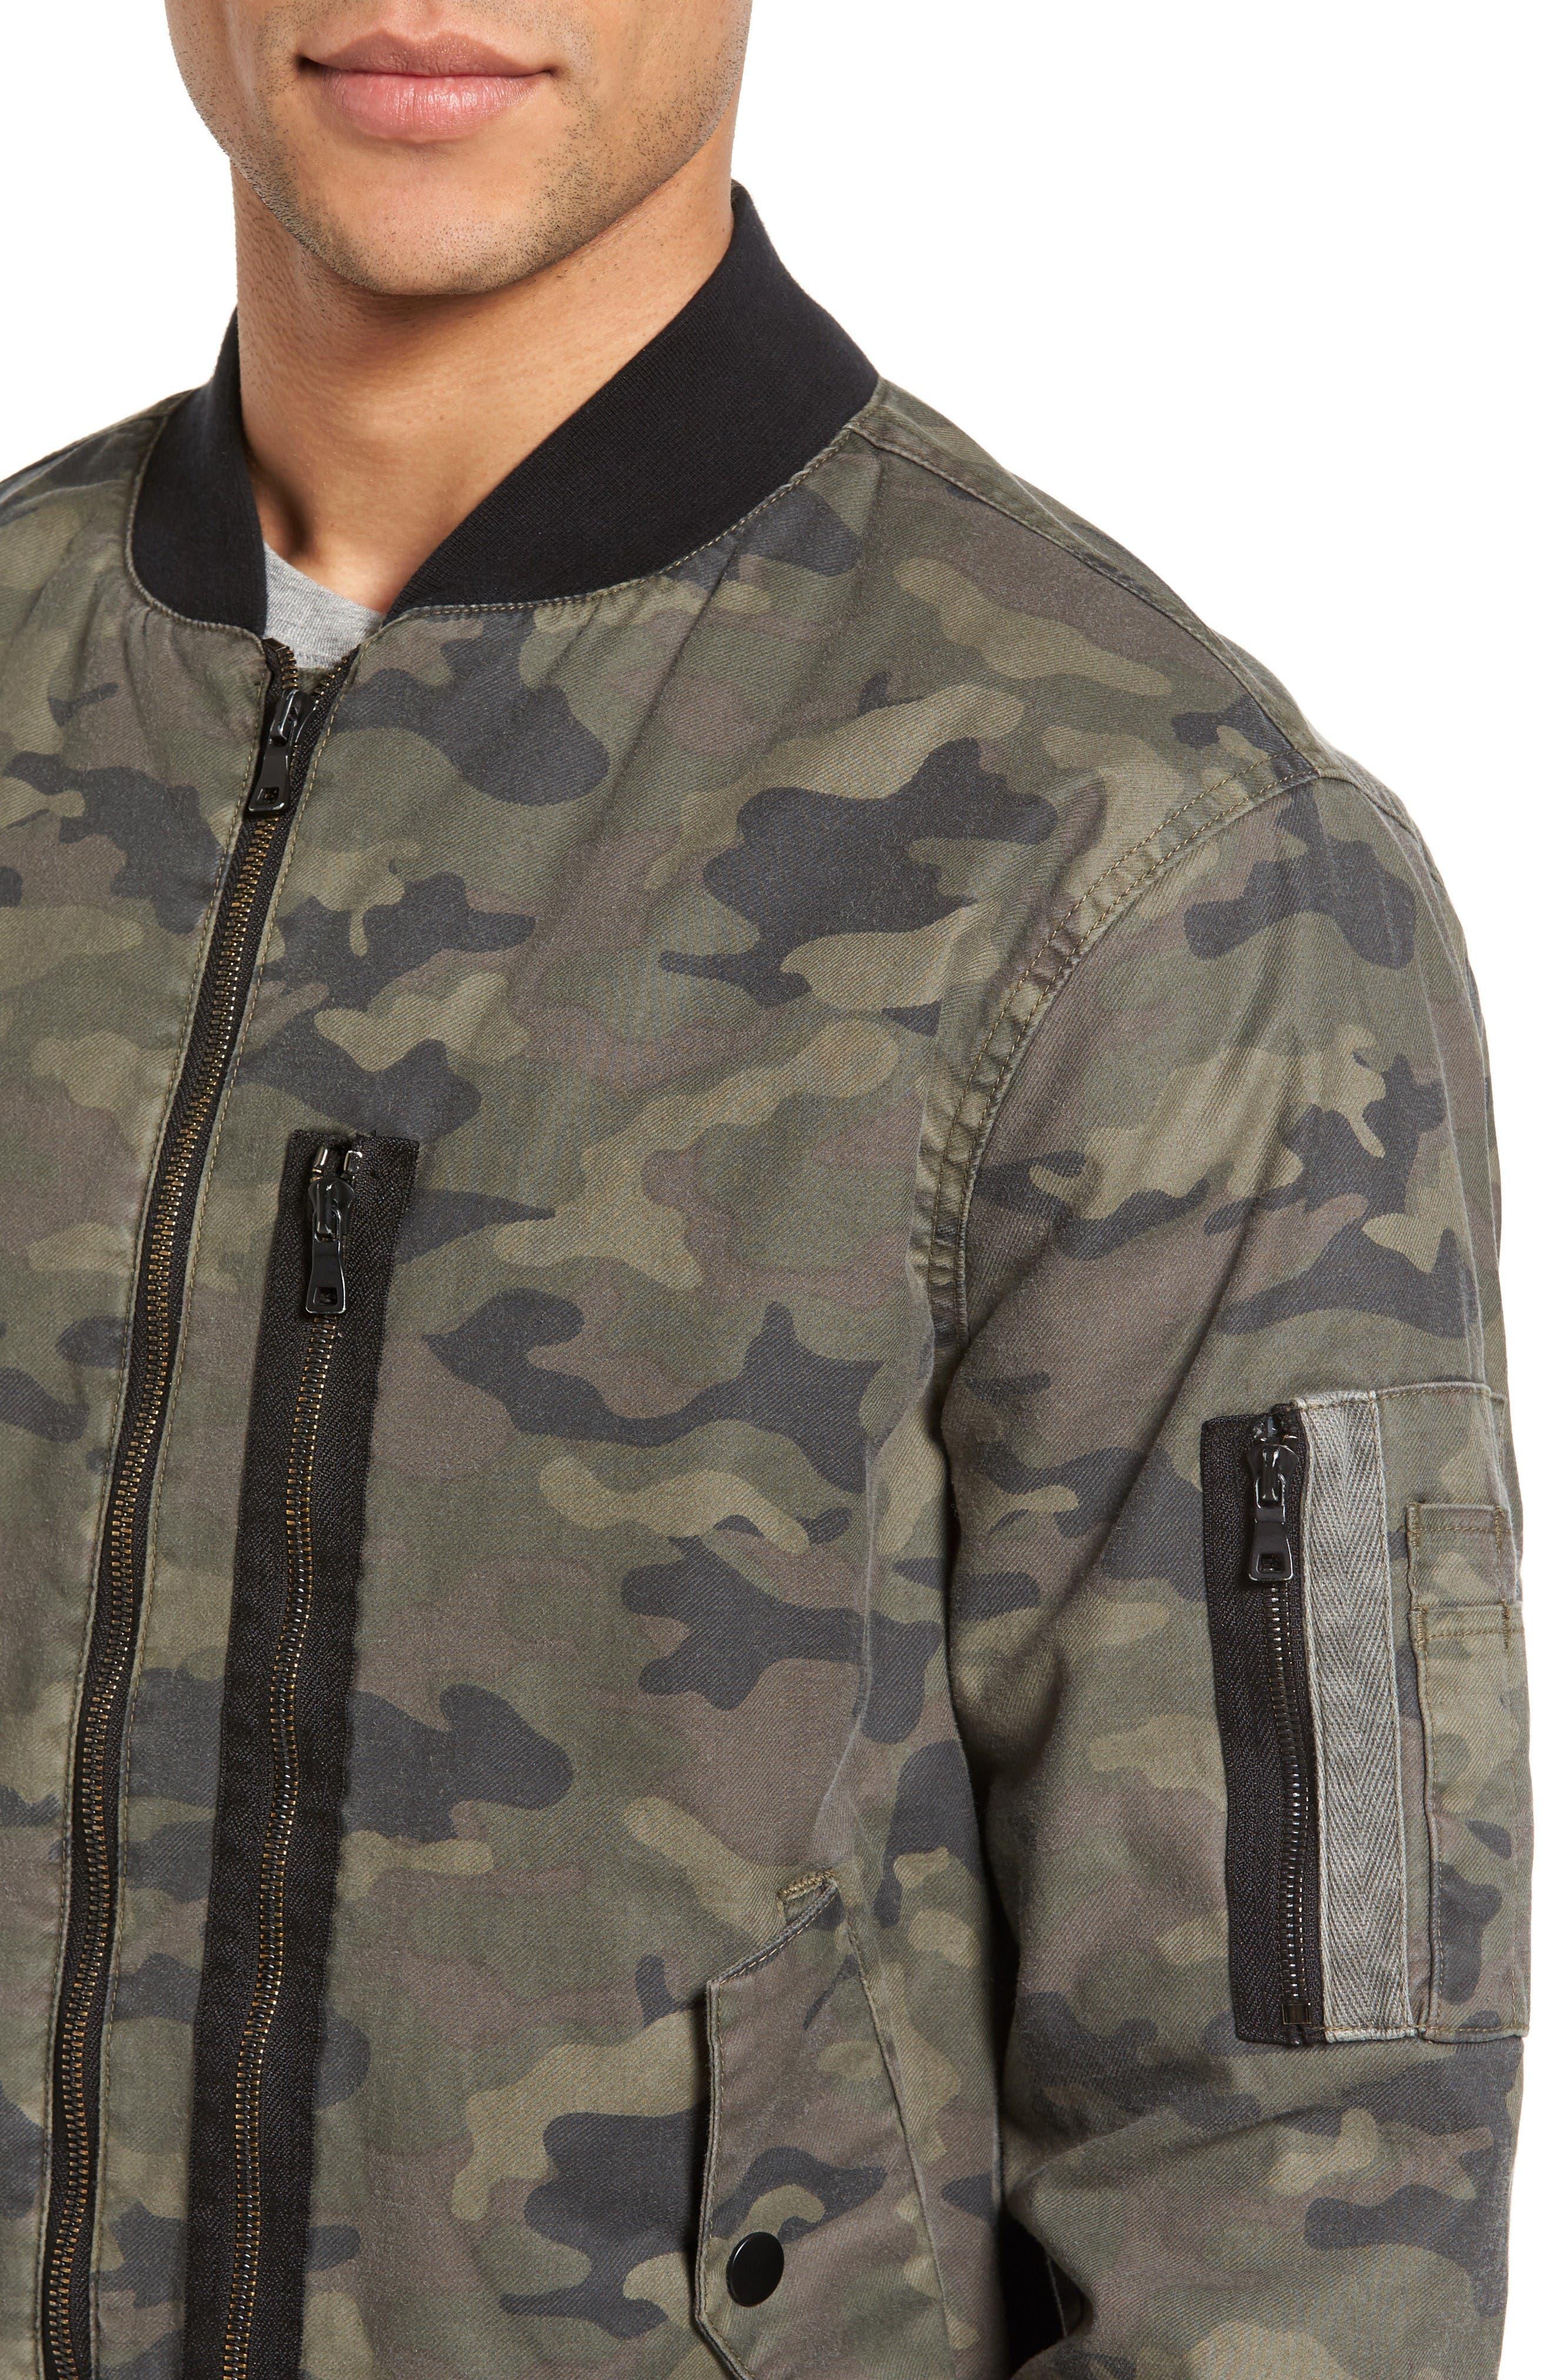 Knox Twill Bomber Jacket,                             Alternate thumbnail 4, color,                             Infantry Camo